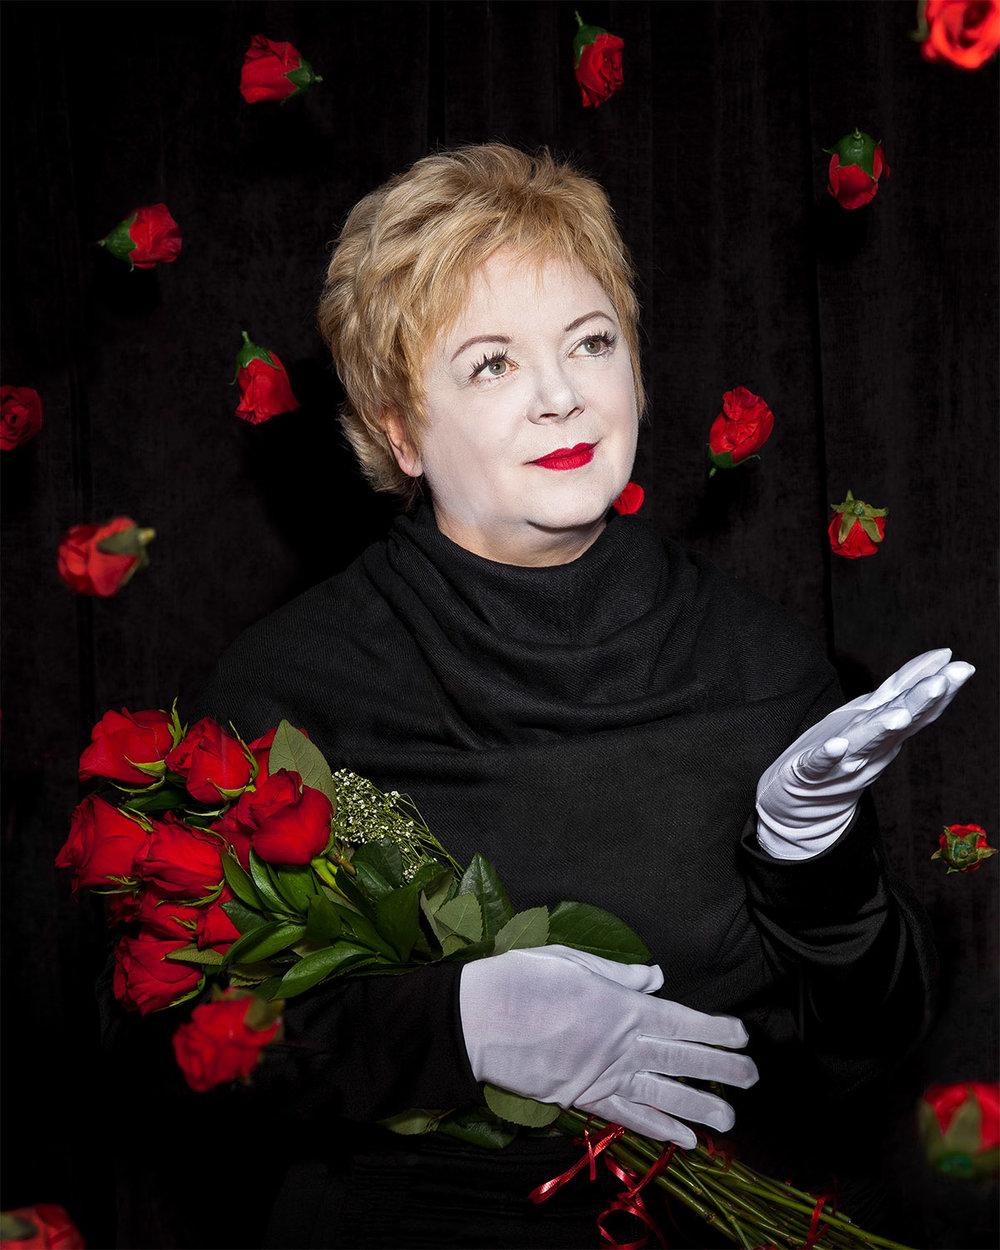 Janice Price